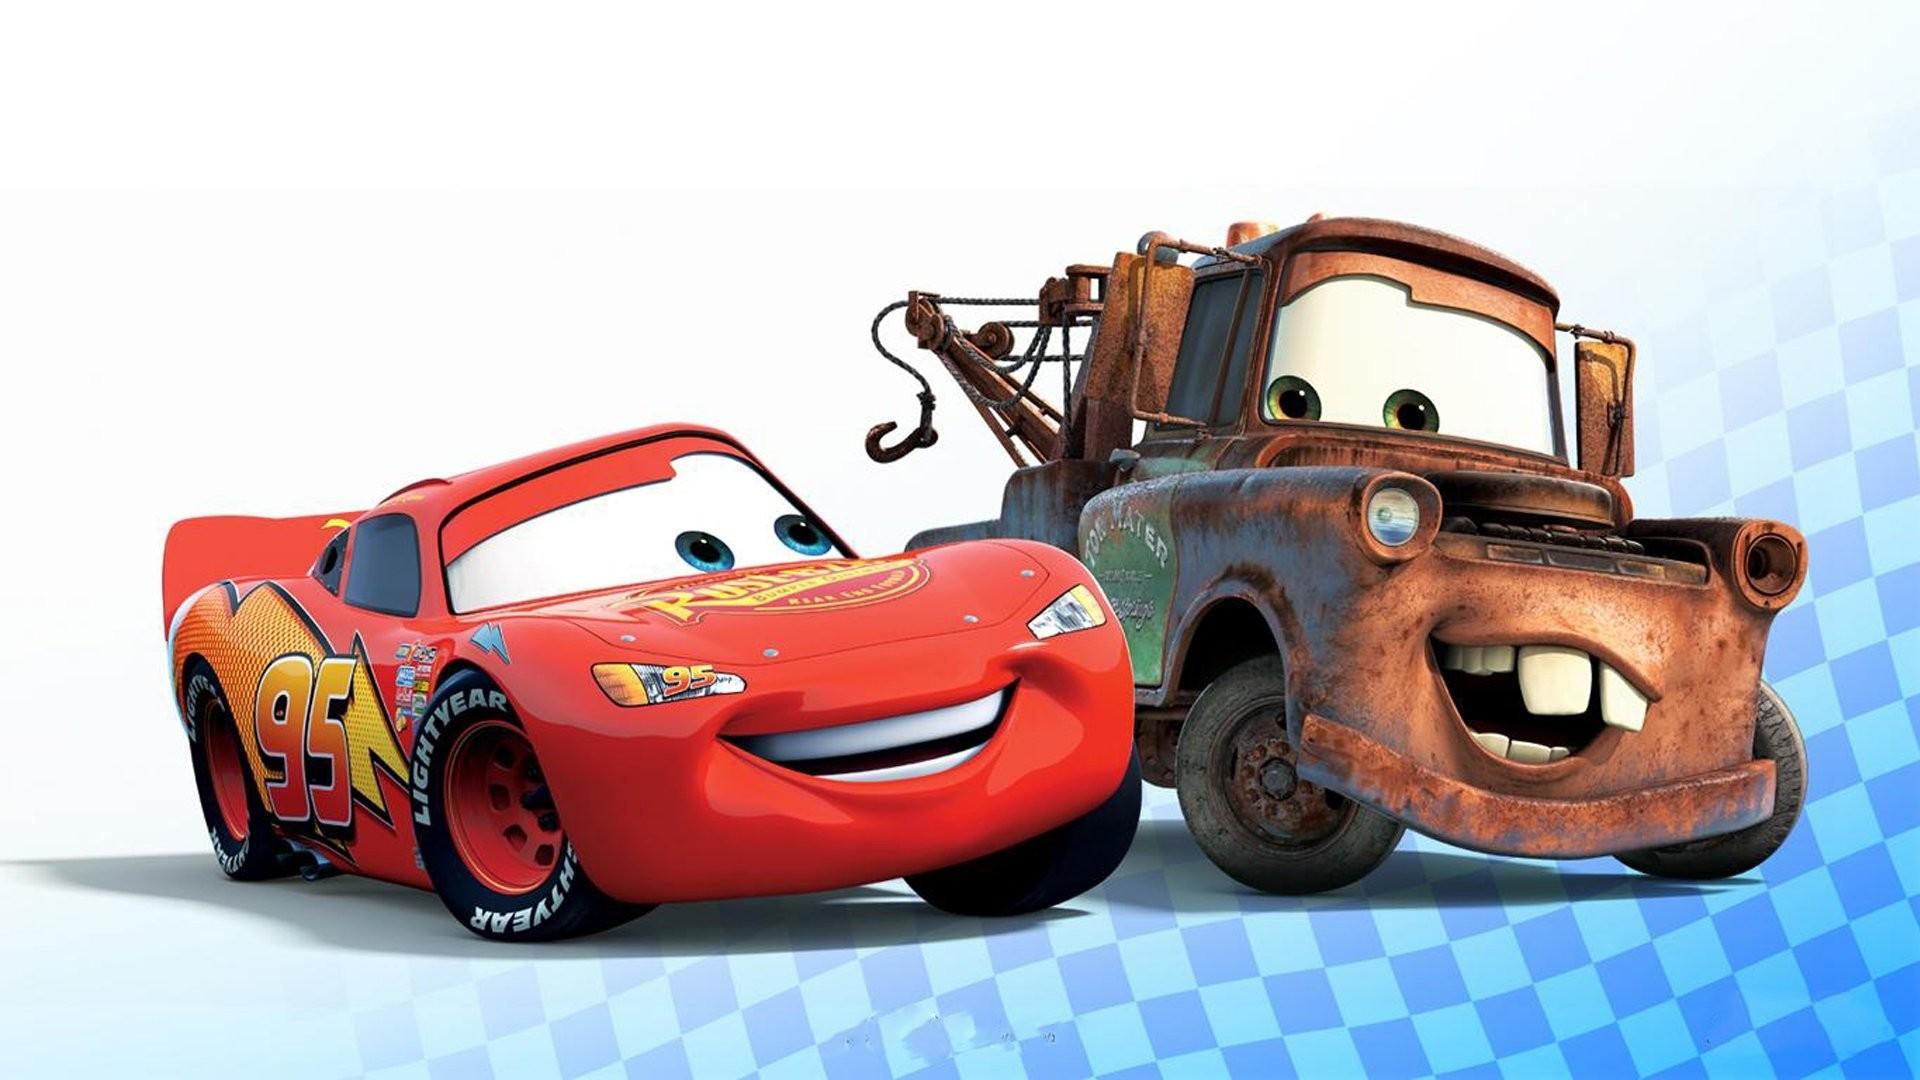 Wallpaper Cars Cartoon 62 Images